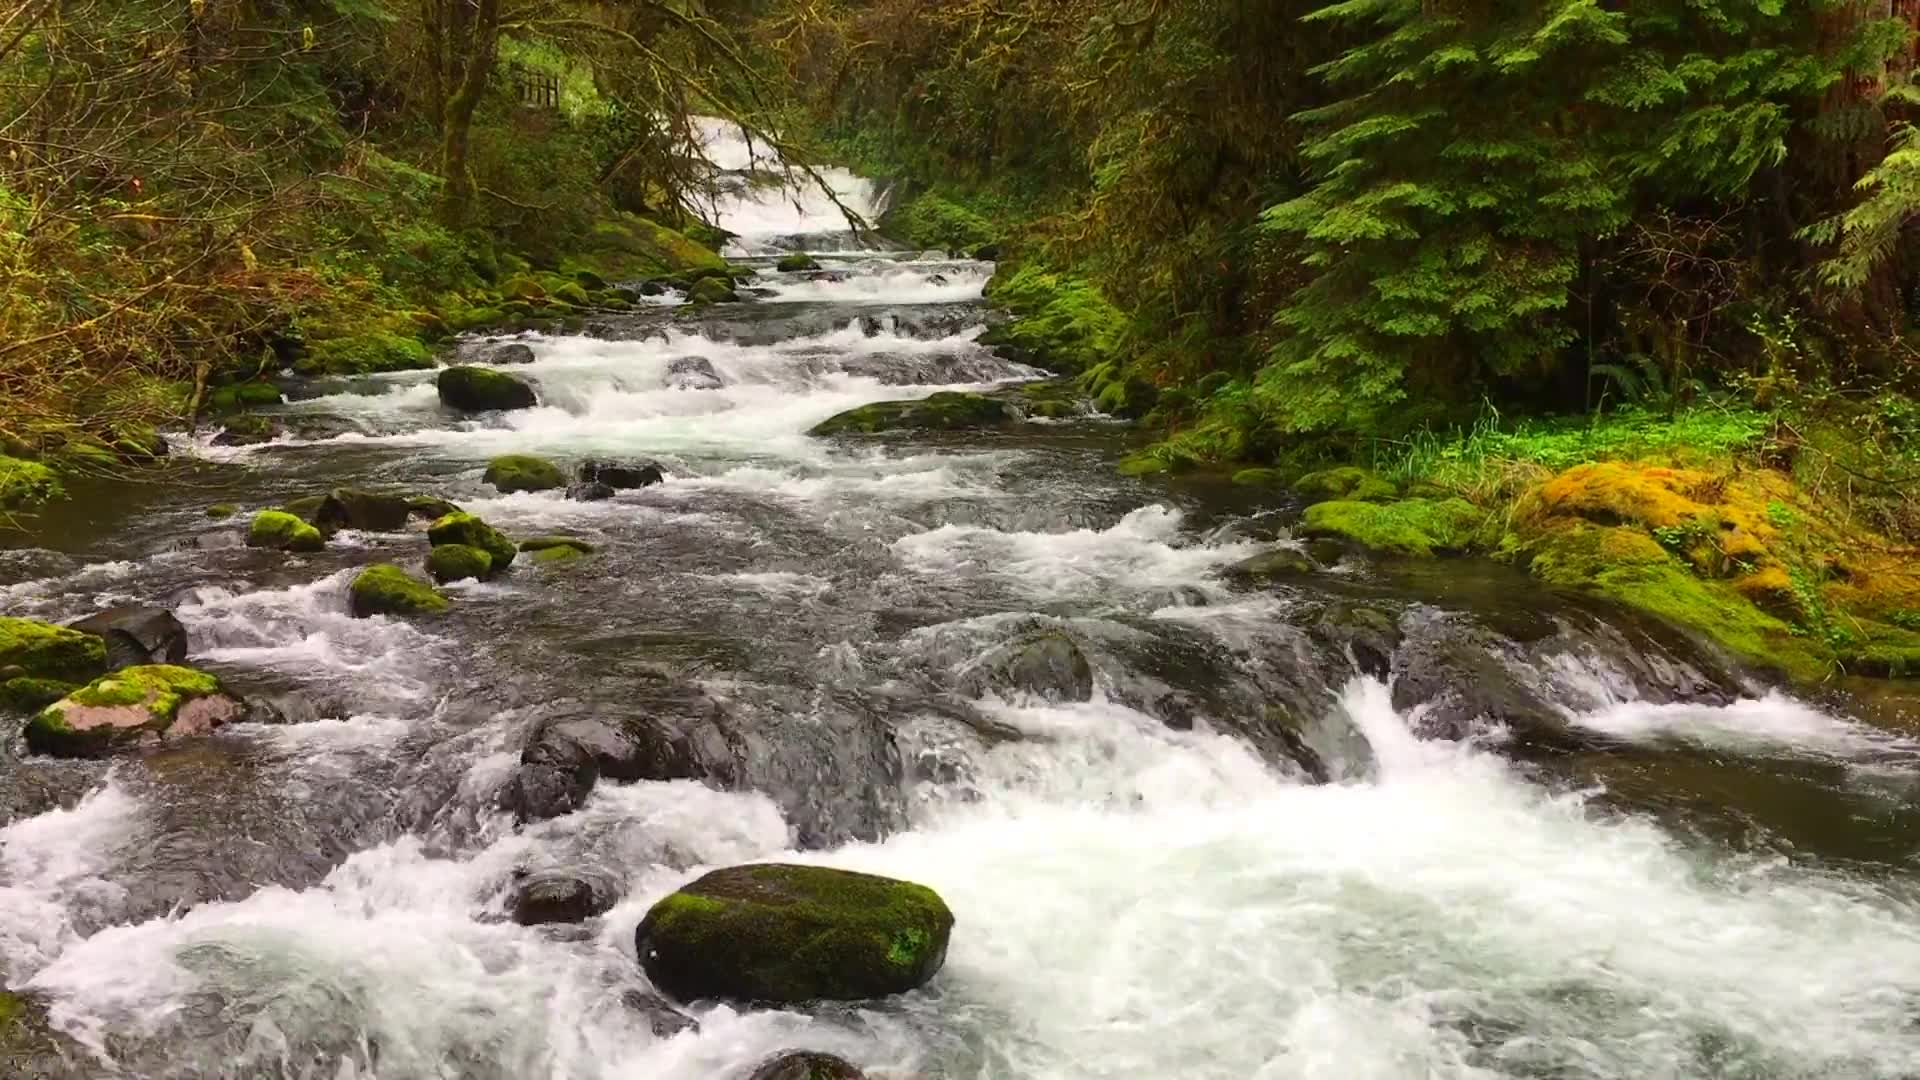 indianas maurice creek makes - HD1920×1080